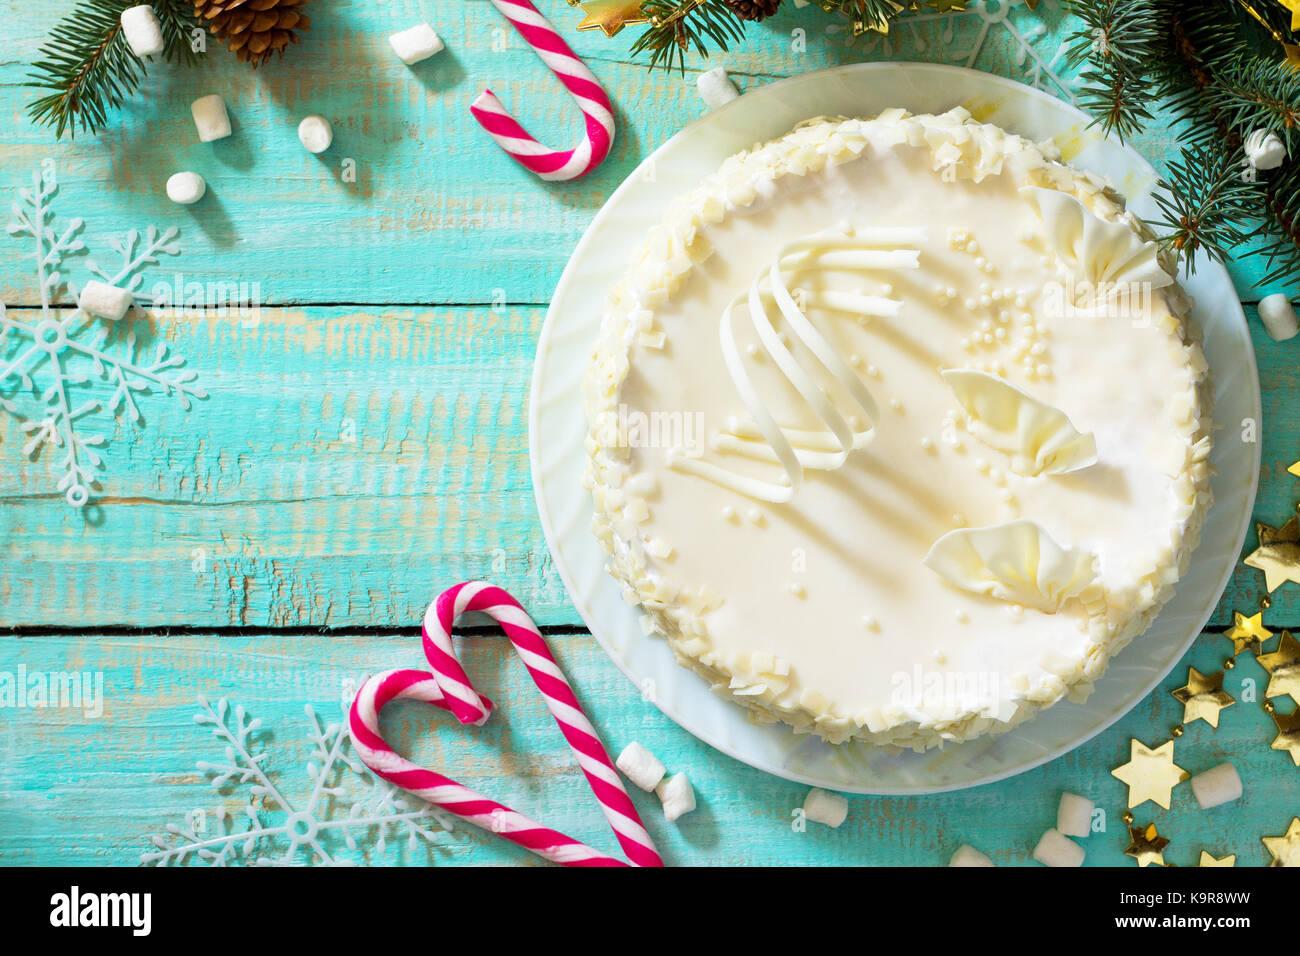 Holiday cake with icing white chocolate on festive christmas background. - Stock Image